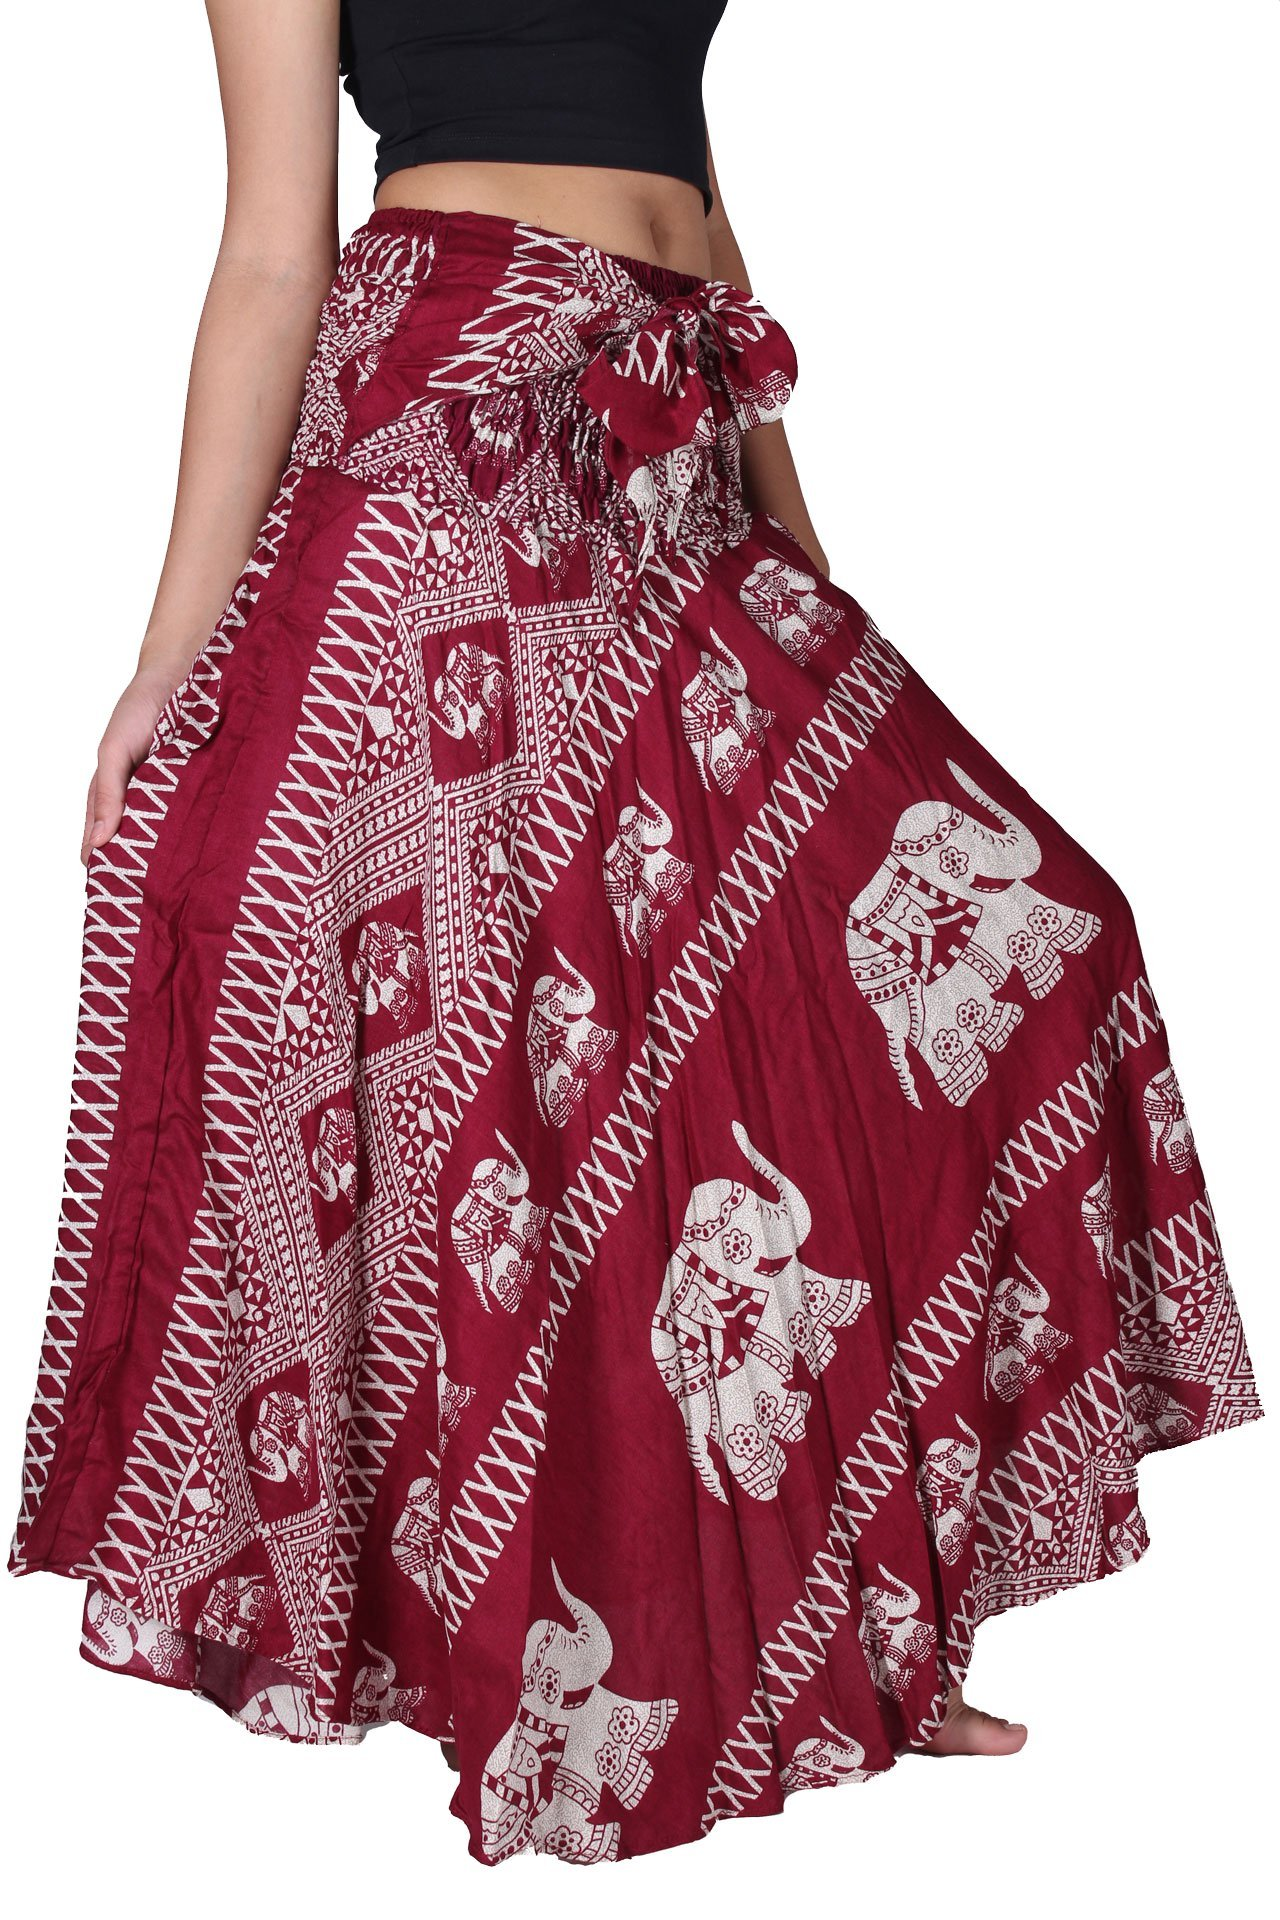 Bangkokpants Women's Long Bohemian Hippie Skirt Boho Dresses Gypsy Clothes Elephant One Size (Red, One Size)